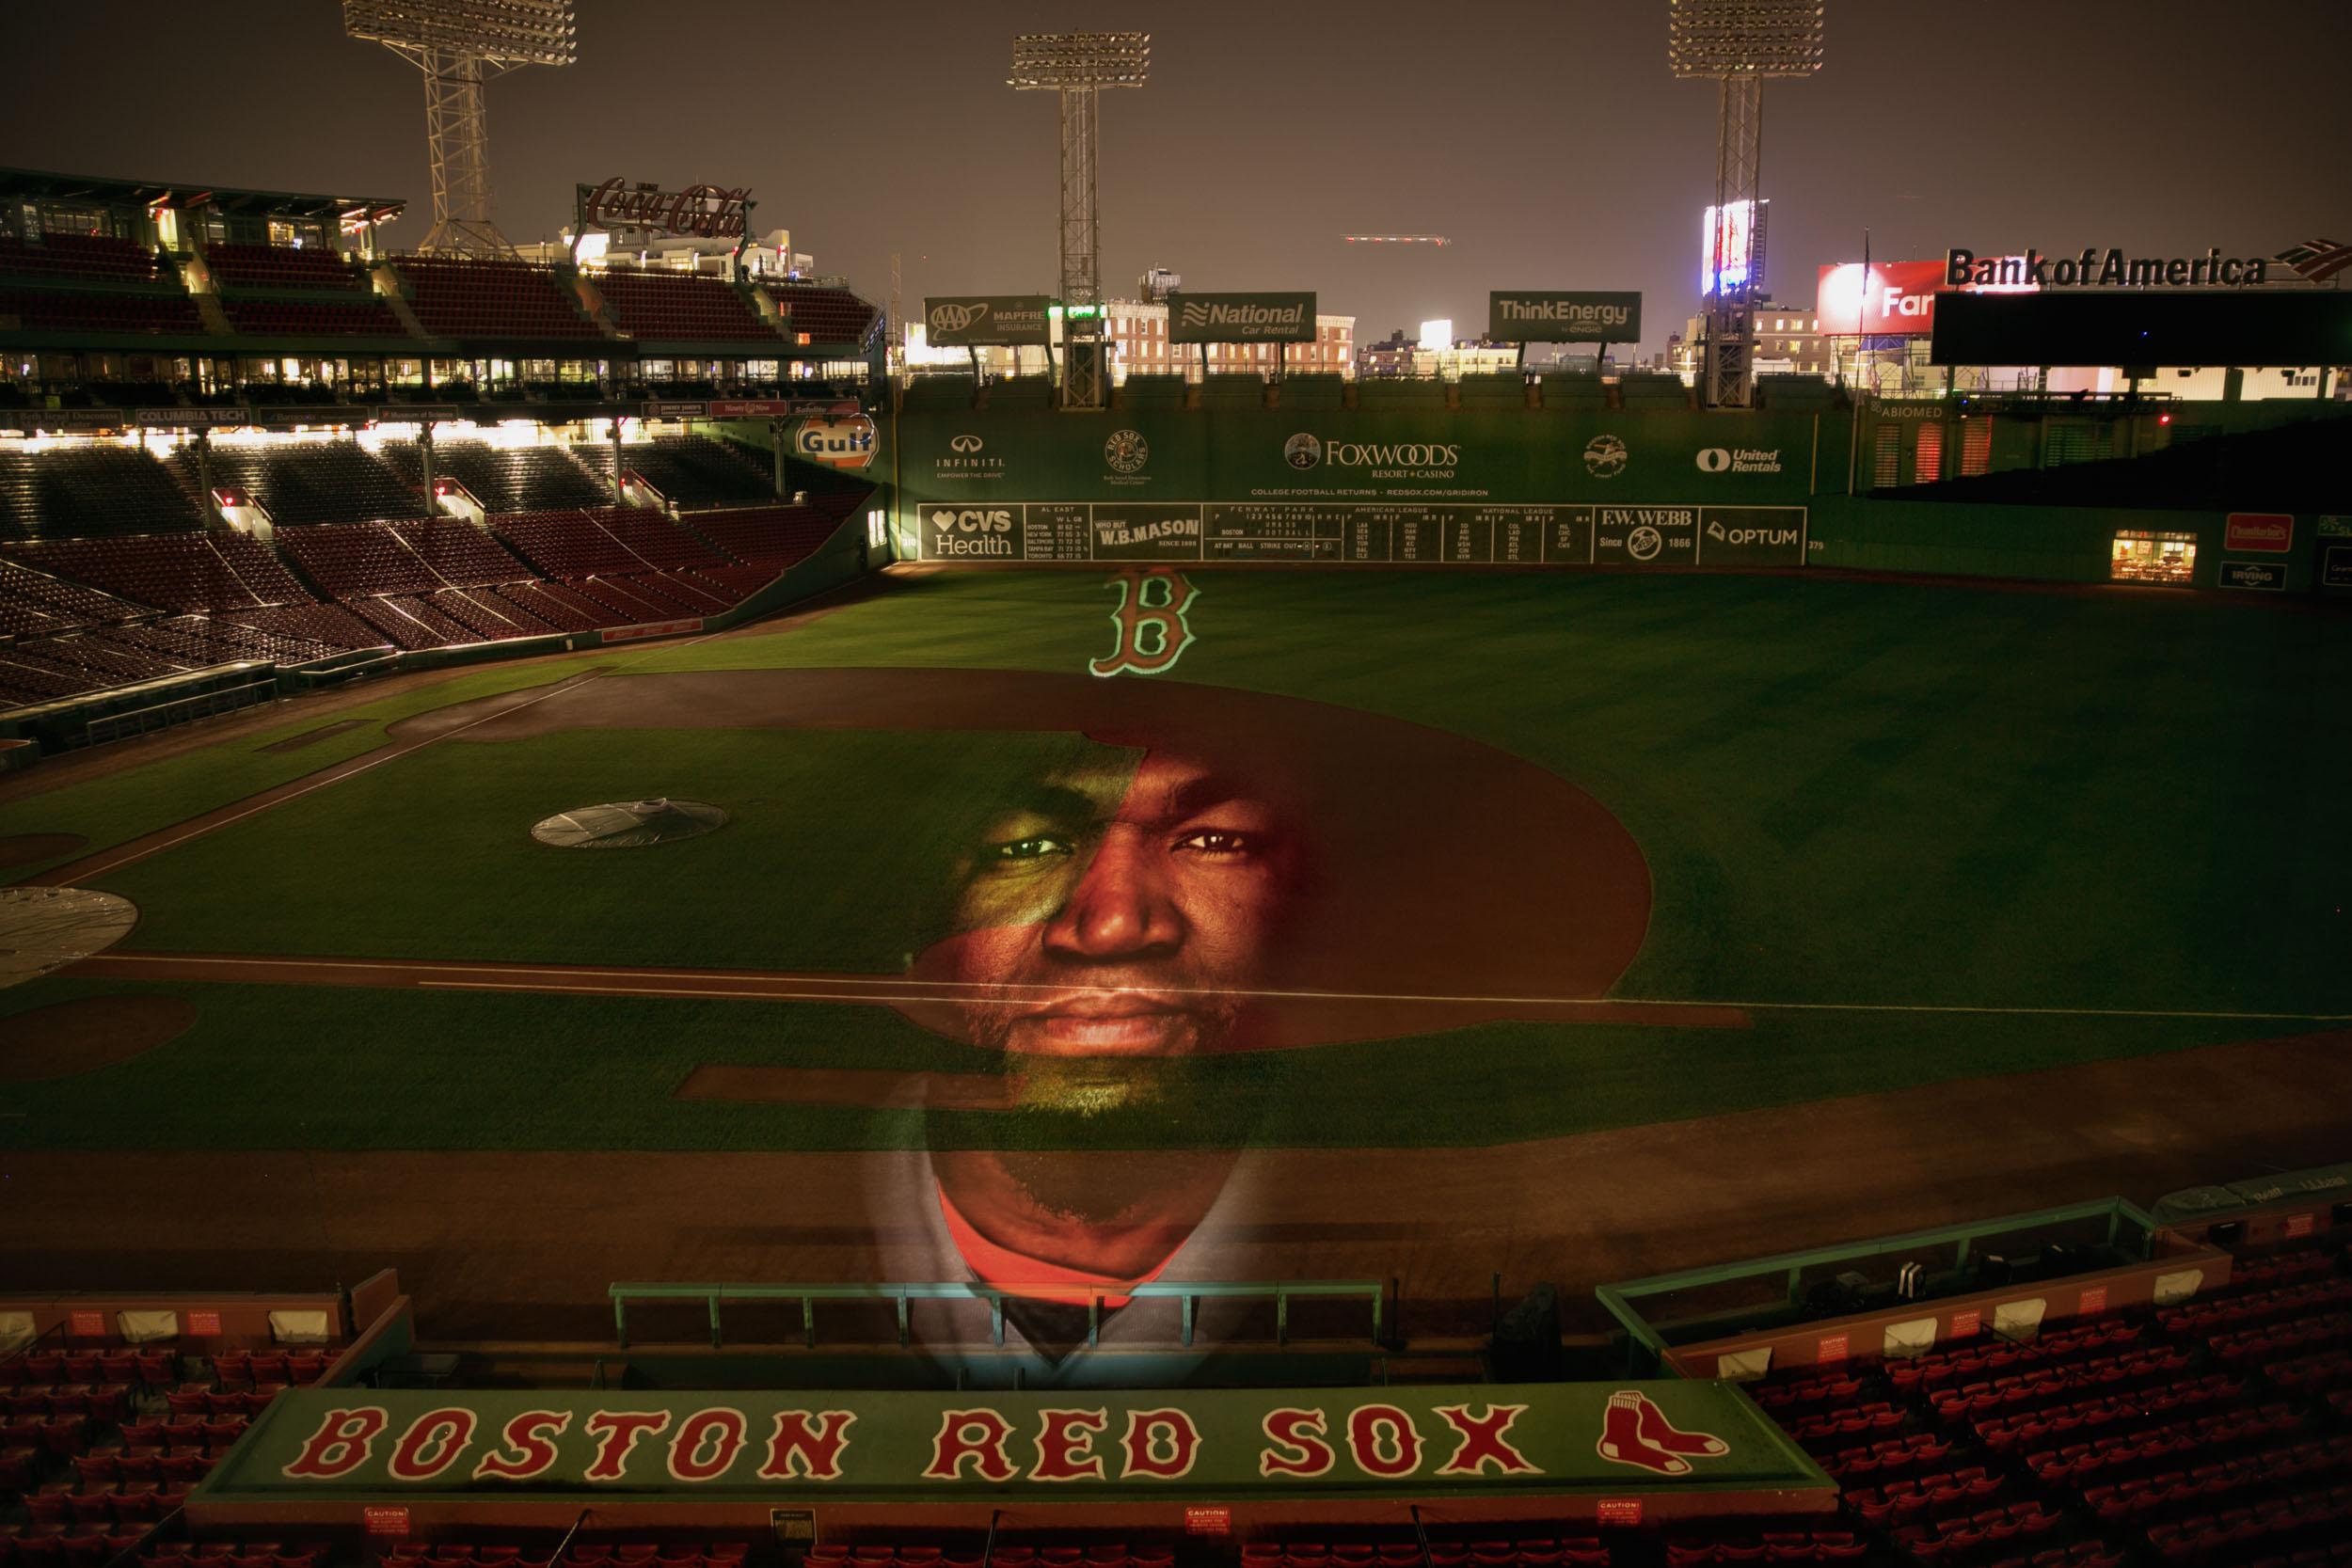 DAVID ORTIZ |DOMINICAN REPUBLIC  - Retired Red Sox Slugger and First Baseman